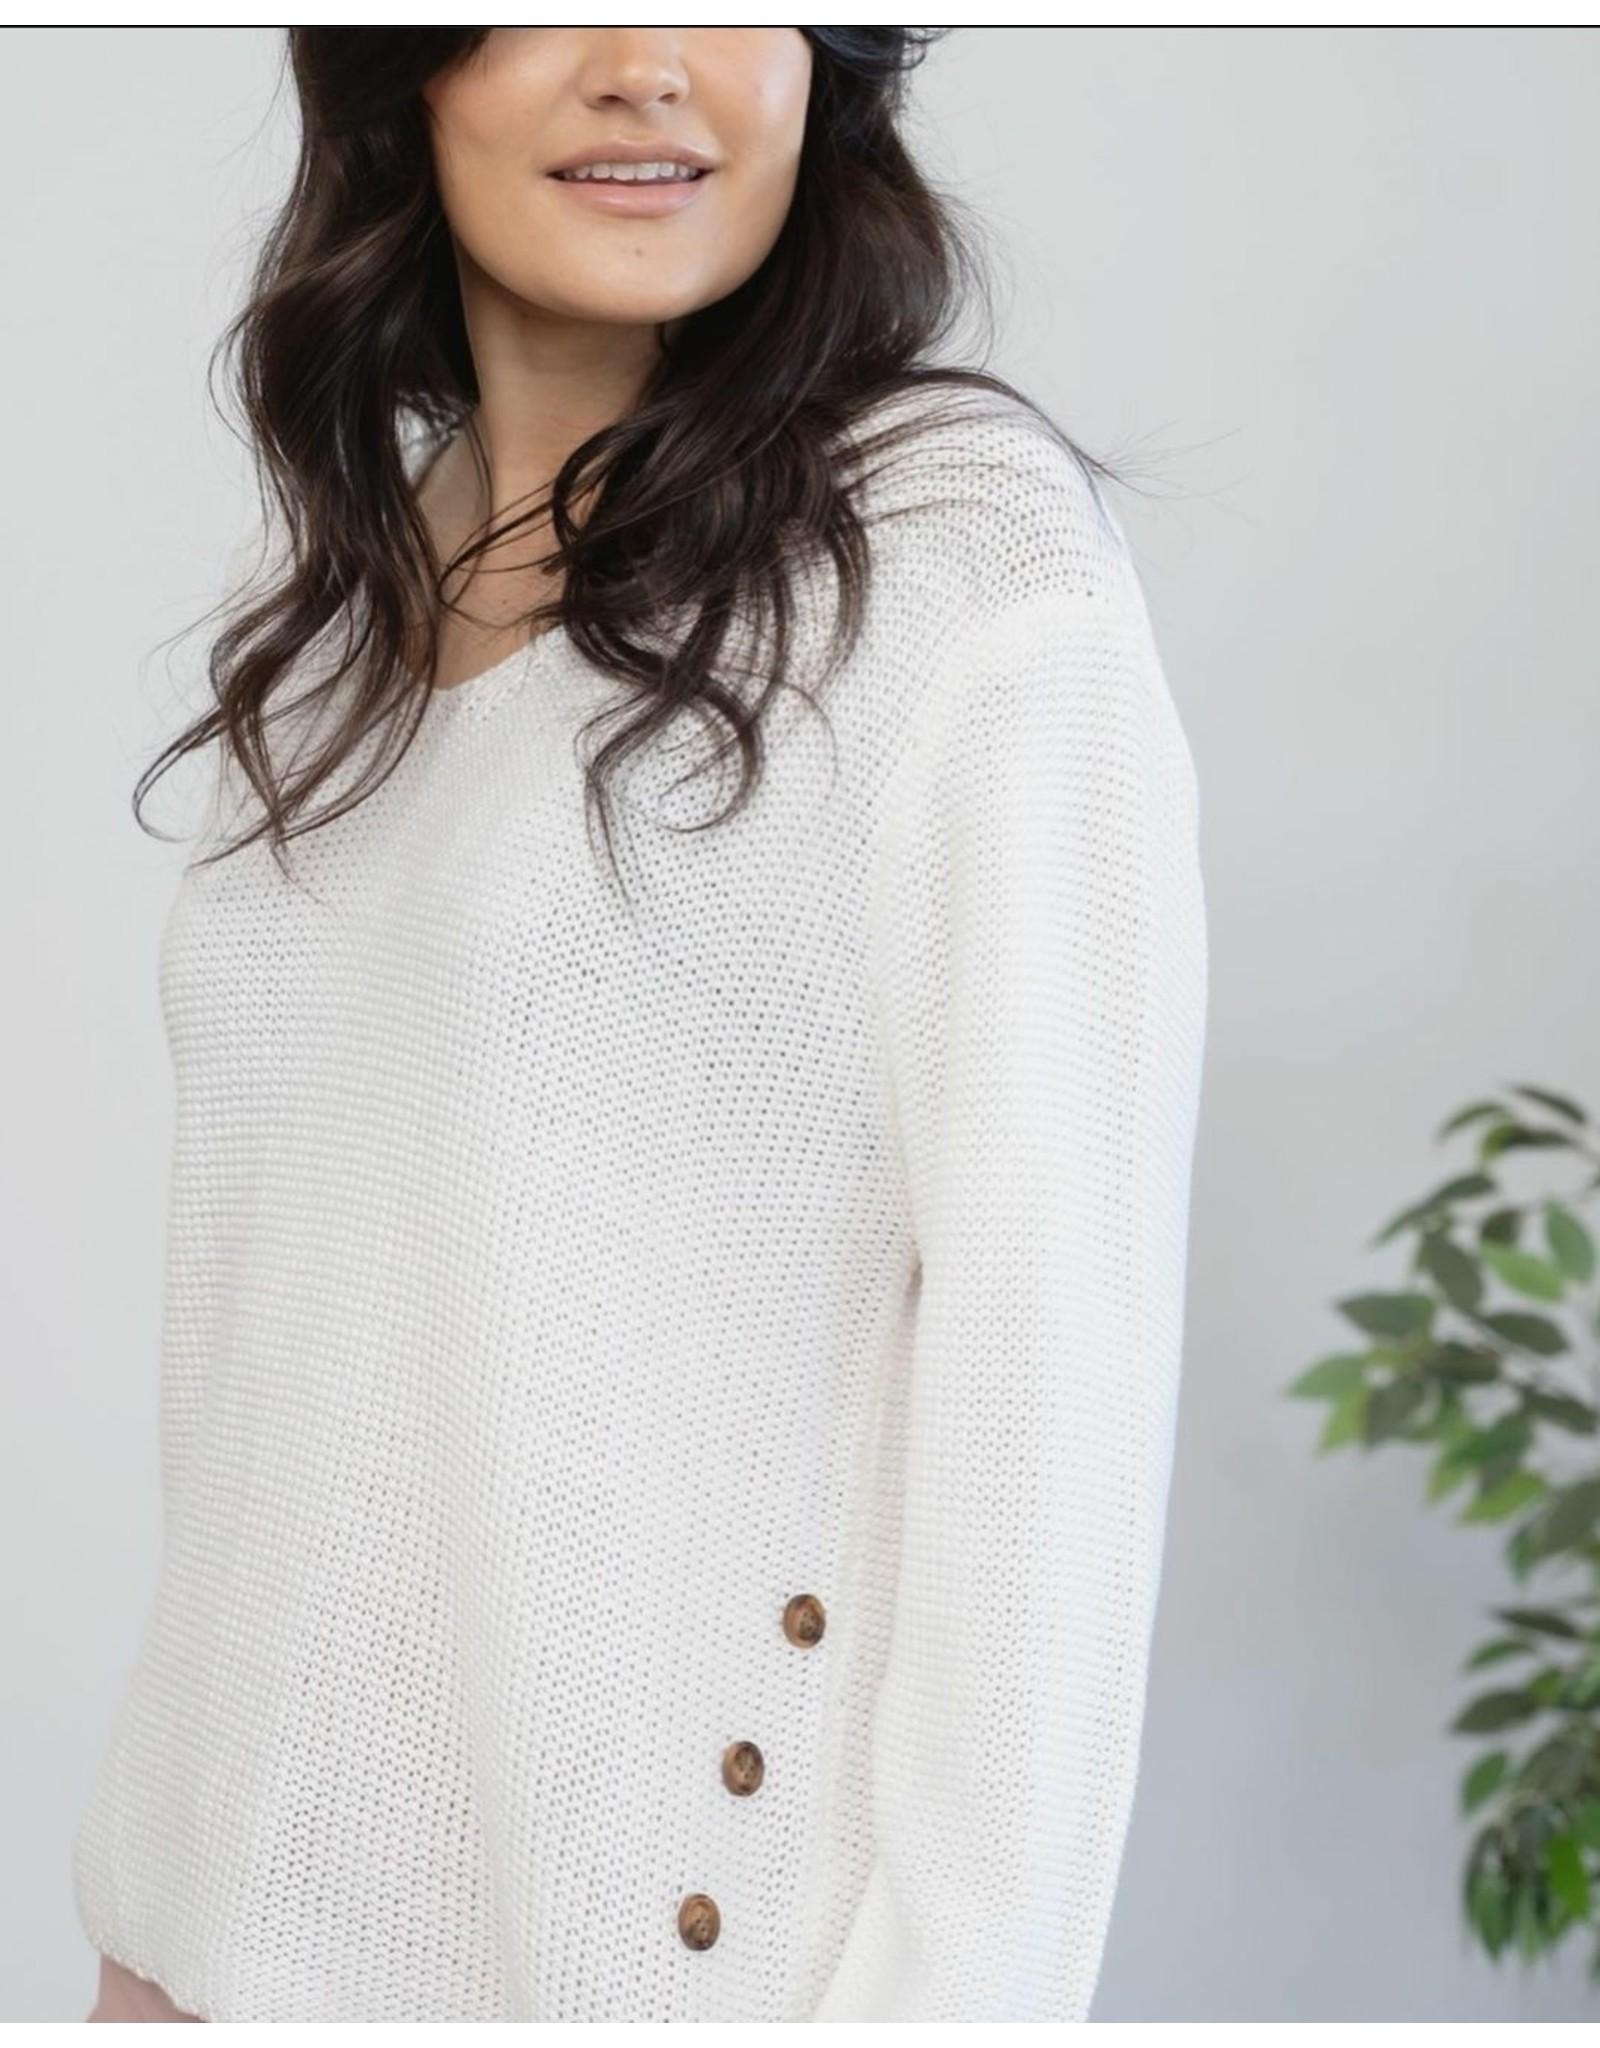 Willow Tree 100% Cotton light knit Jumper